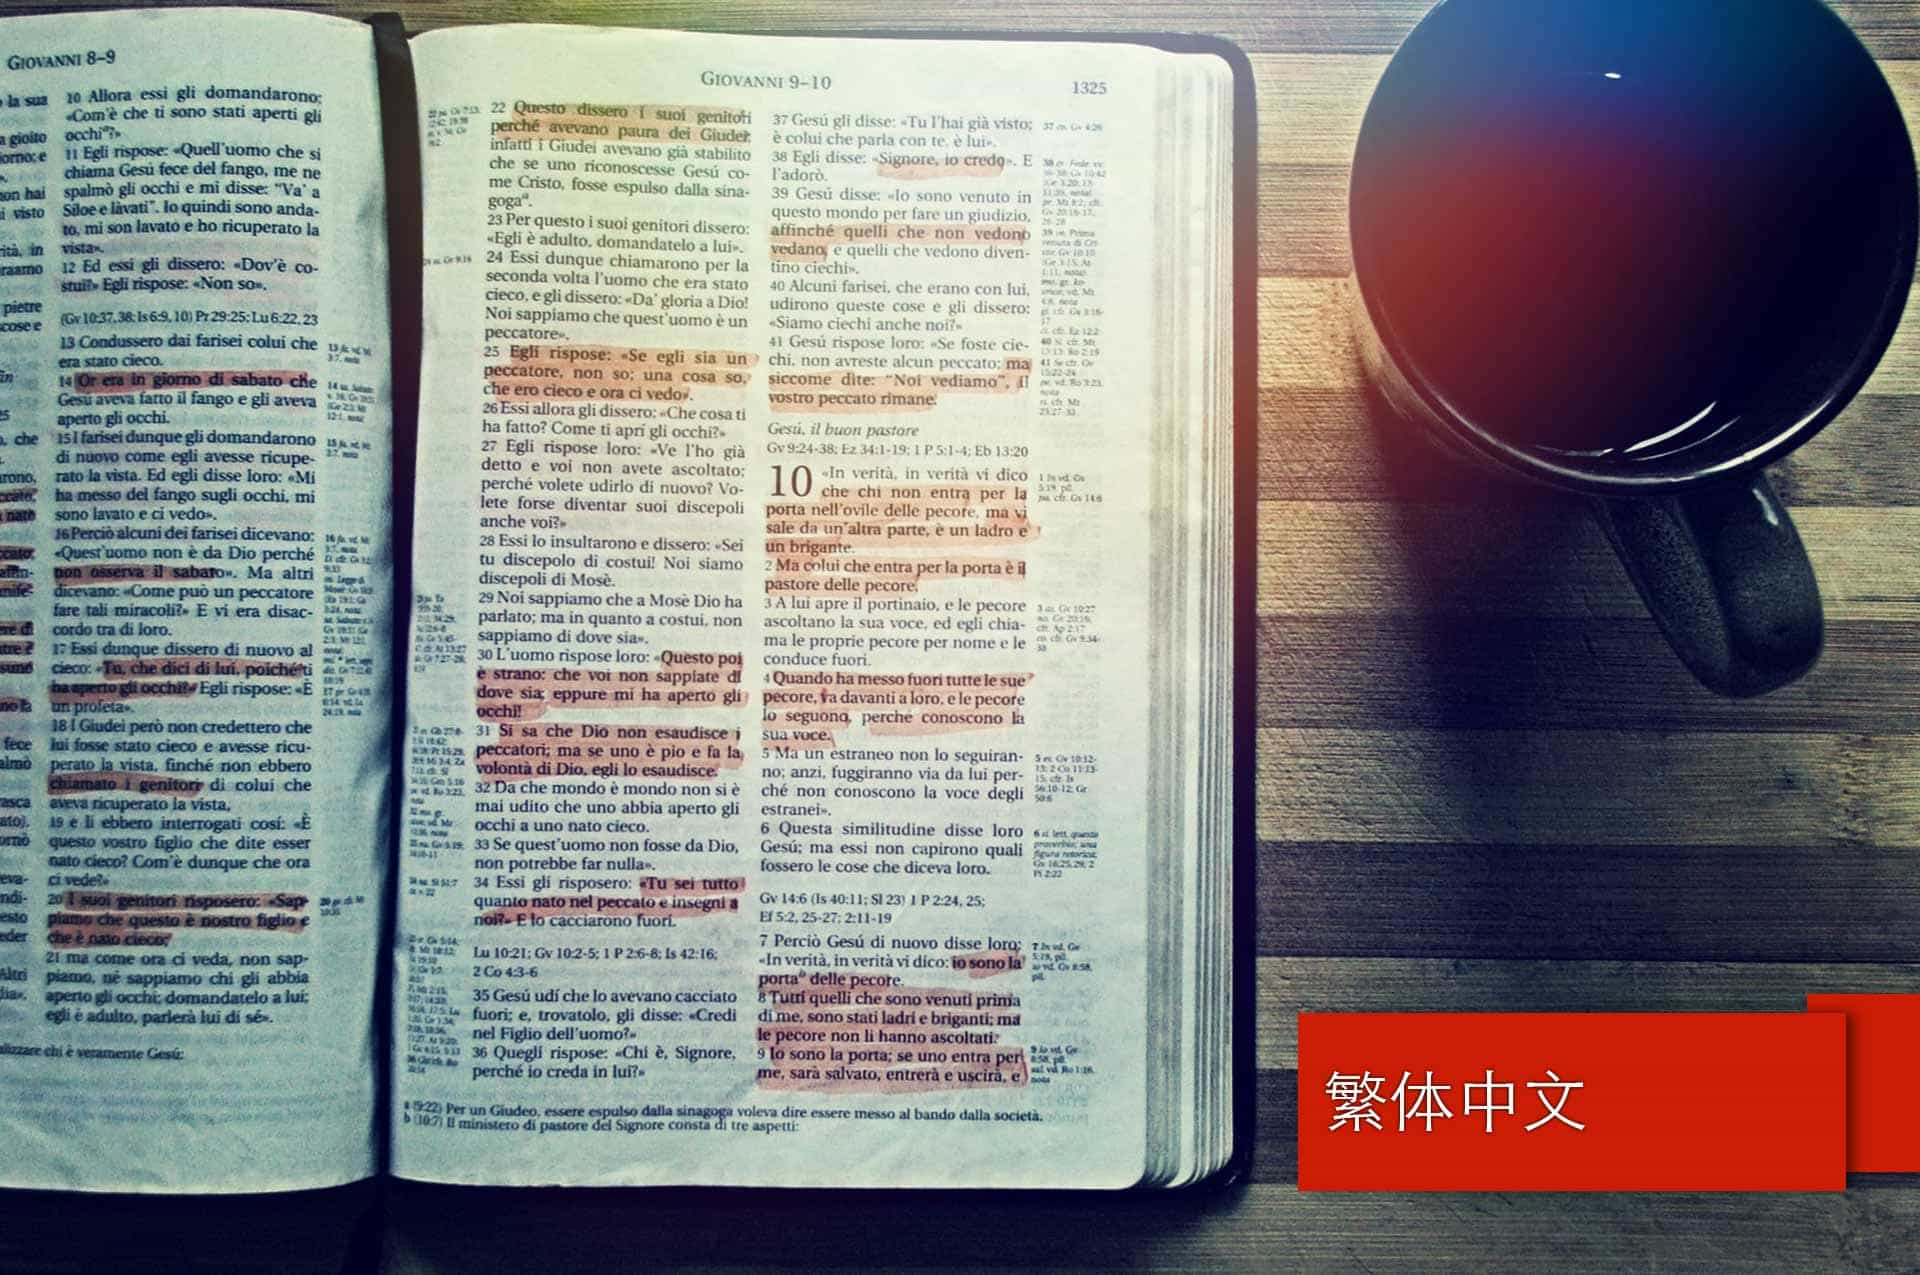 读懂圣经 – 道成肉身的密匙 (Understanding the Bible – The Incarnation Code) – Traditional Chinese